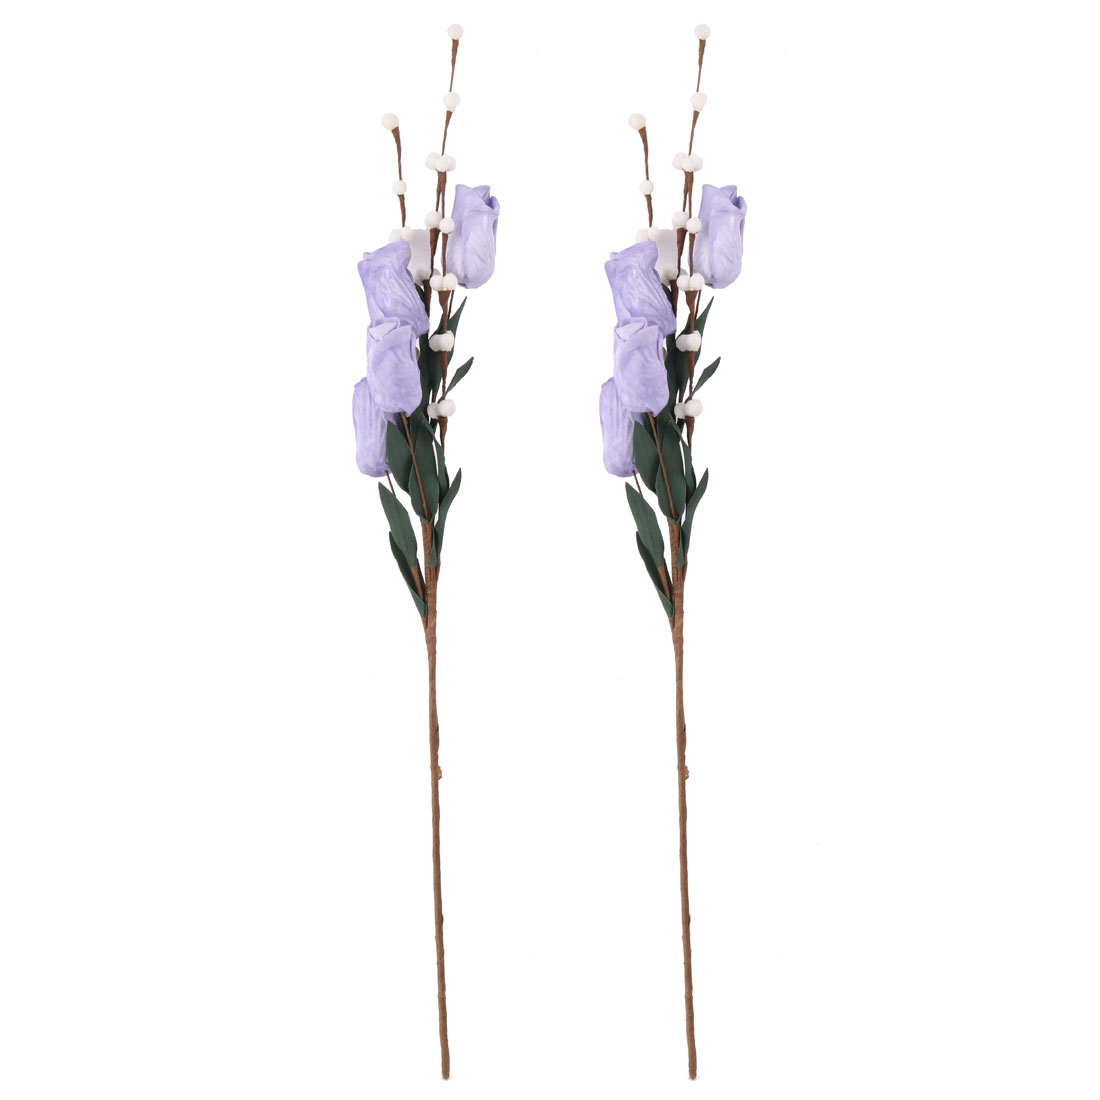 Living Room Garden Foam Tulip Shaped Table Decor Artificial Flower Purple 2 Pcs - image 4 of 4